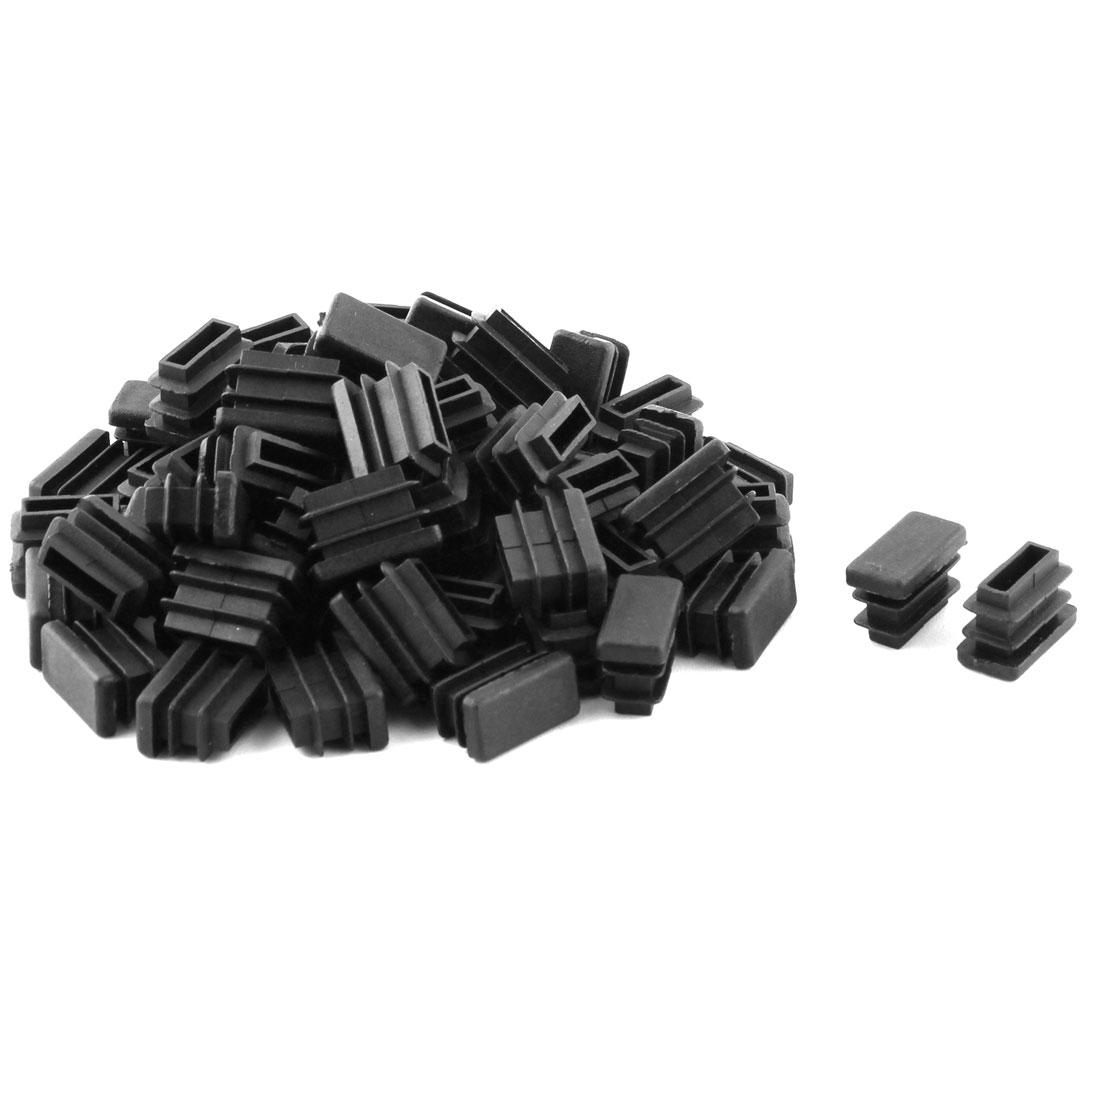 Plastic Rectangle Design Tube Insert End Blanking Cover Cap Black 10.5 x 20.5mm 60pcs